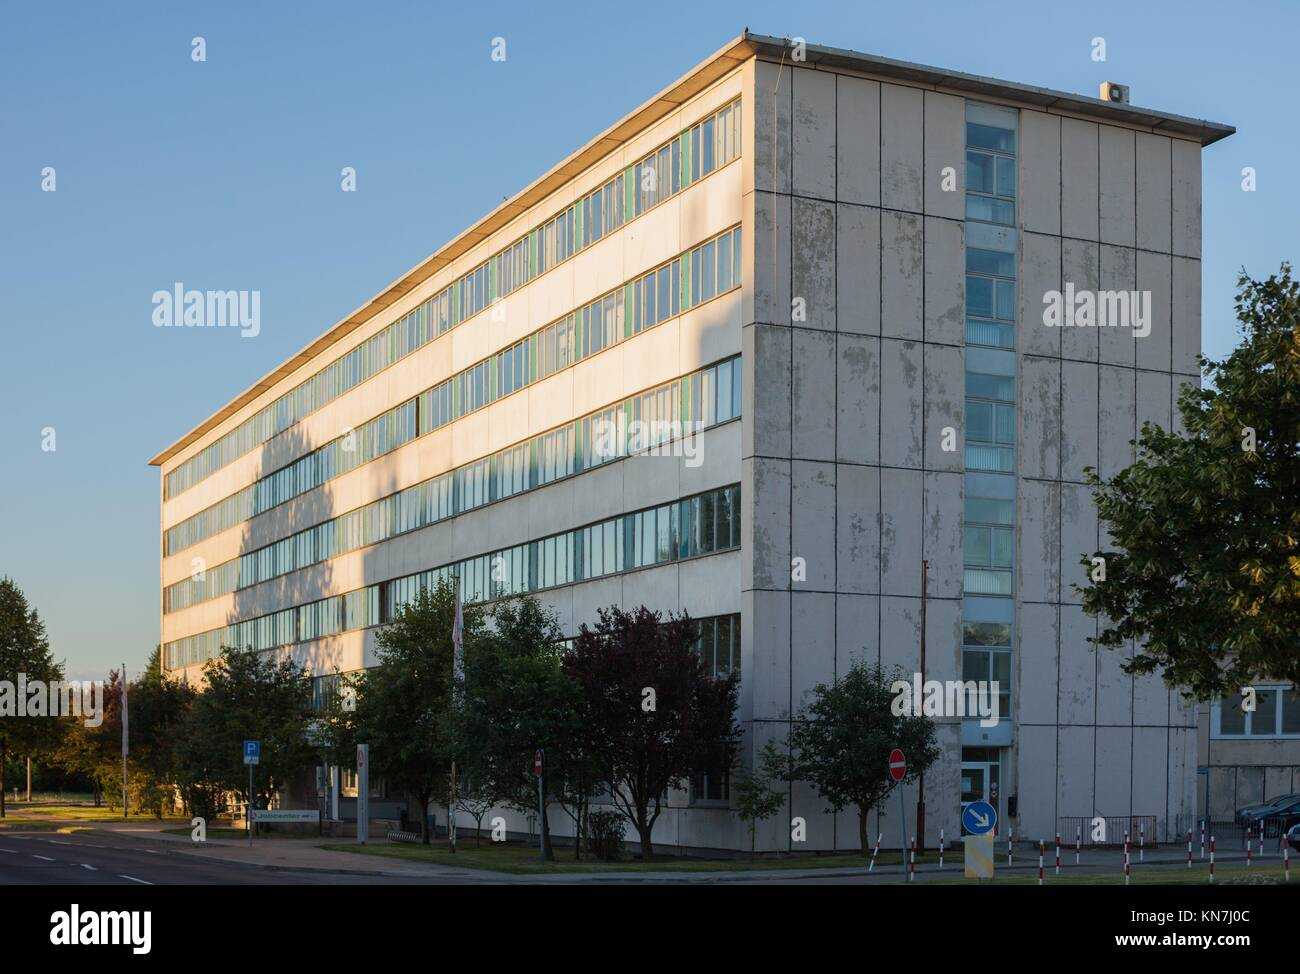 Former Stasi headquarters in Frankfurt (Oder), Germany, now the Agentur fuer Arbeit. - Stock Image